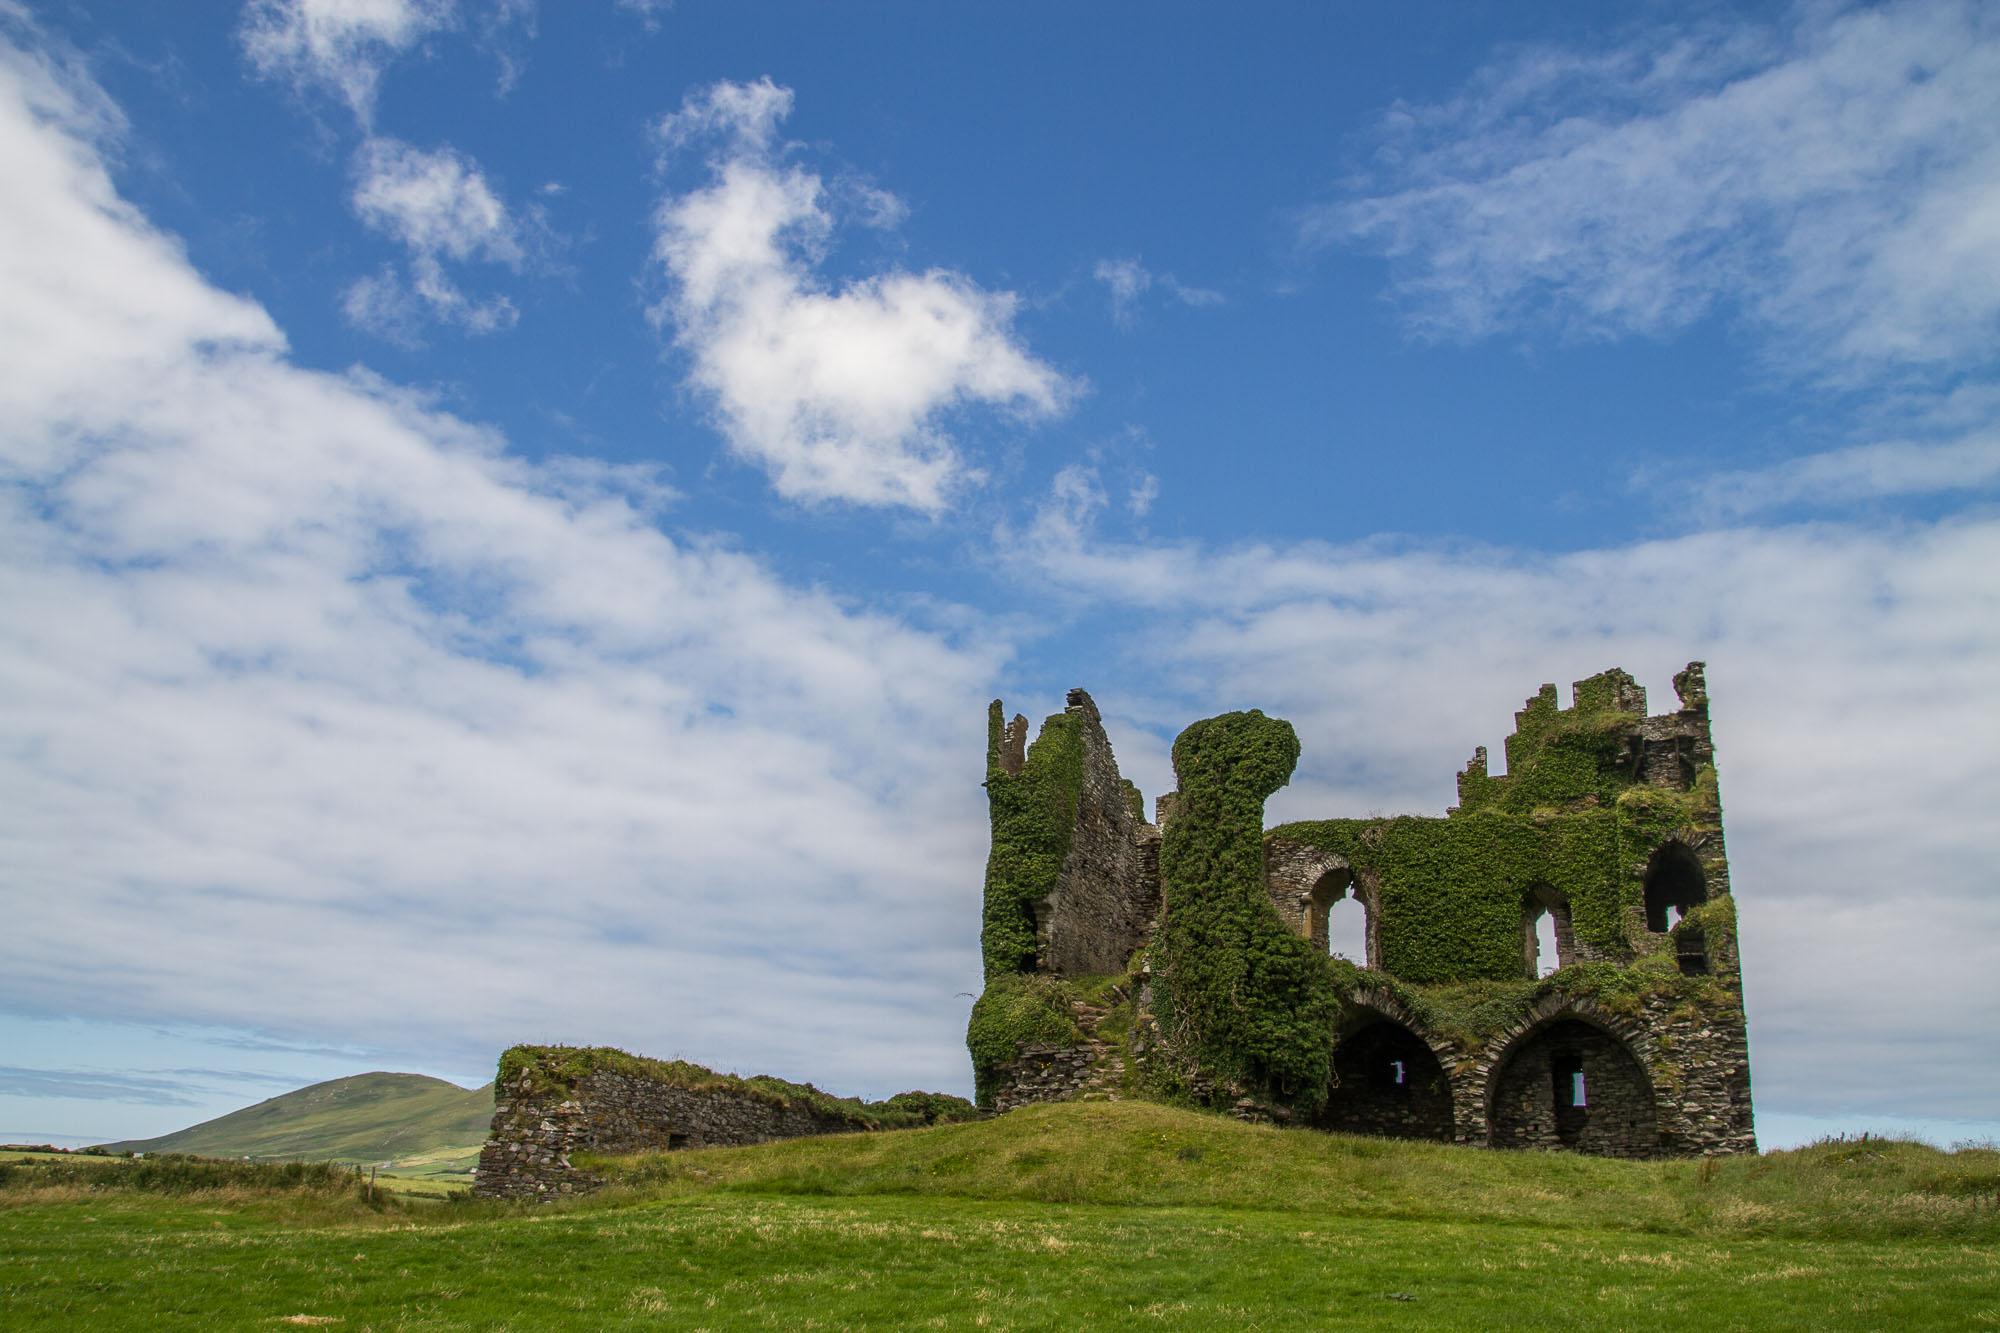 Ballicarbery Castle, côté face